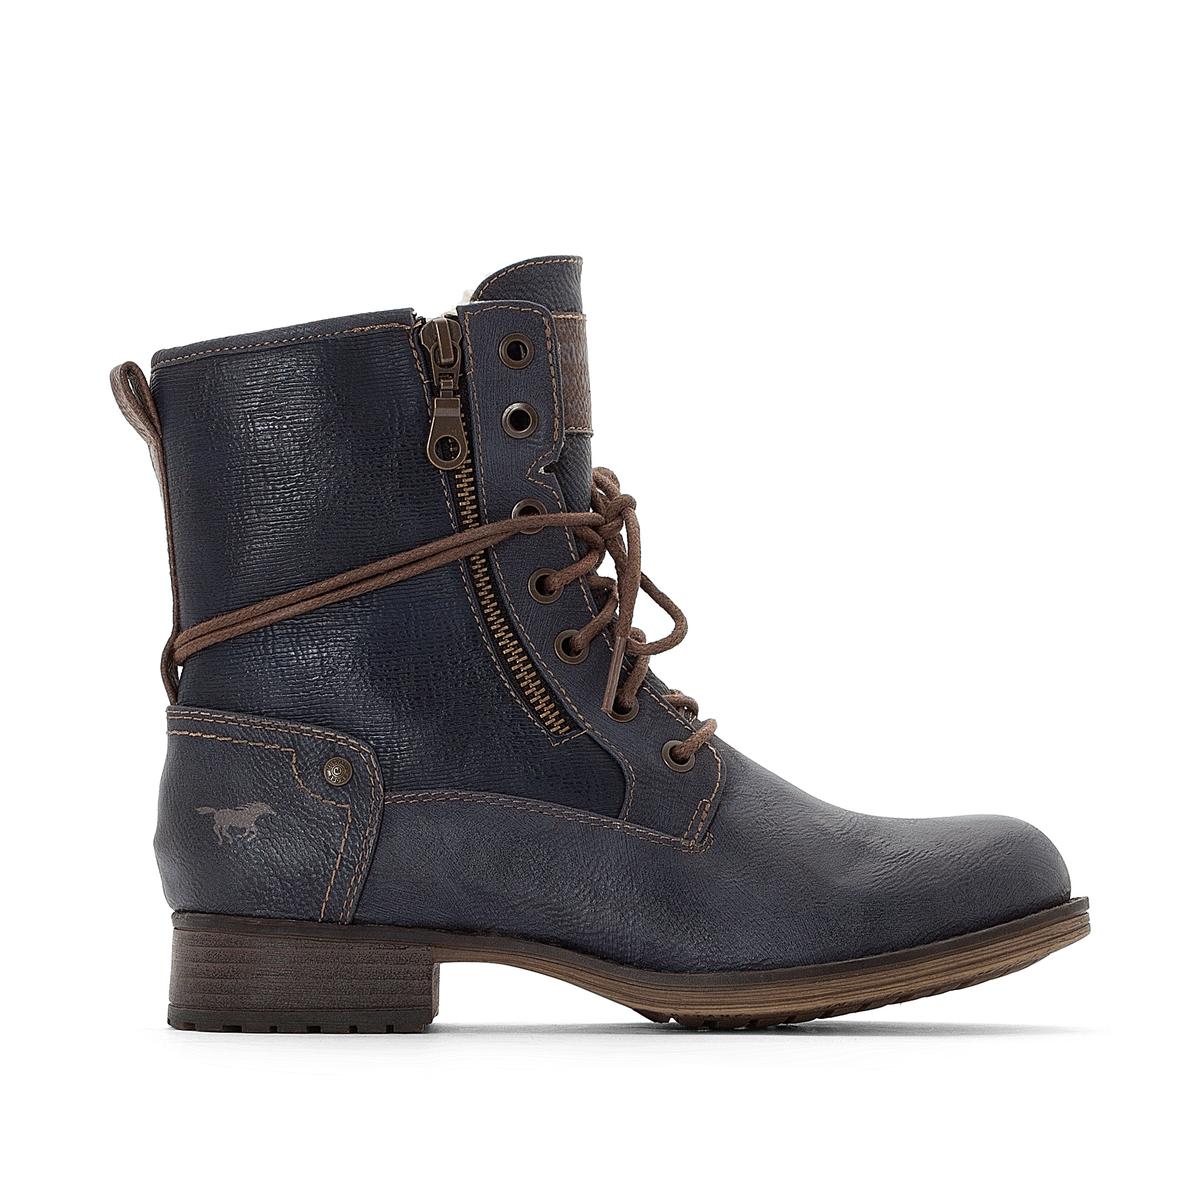 Ботинки La Redoute На шнуровке 36 синий